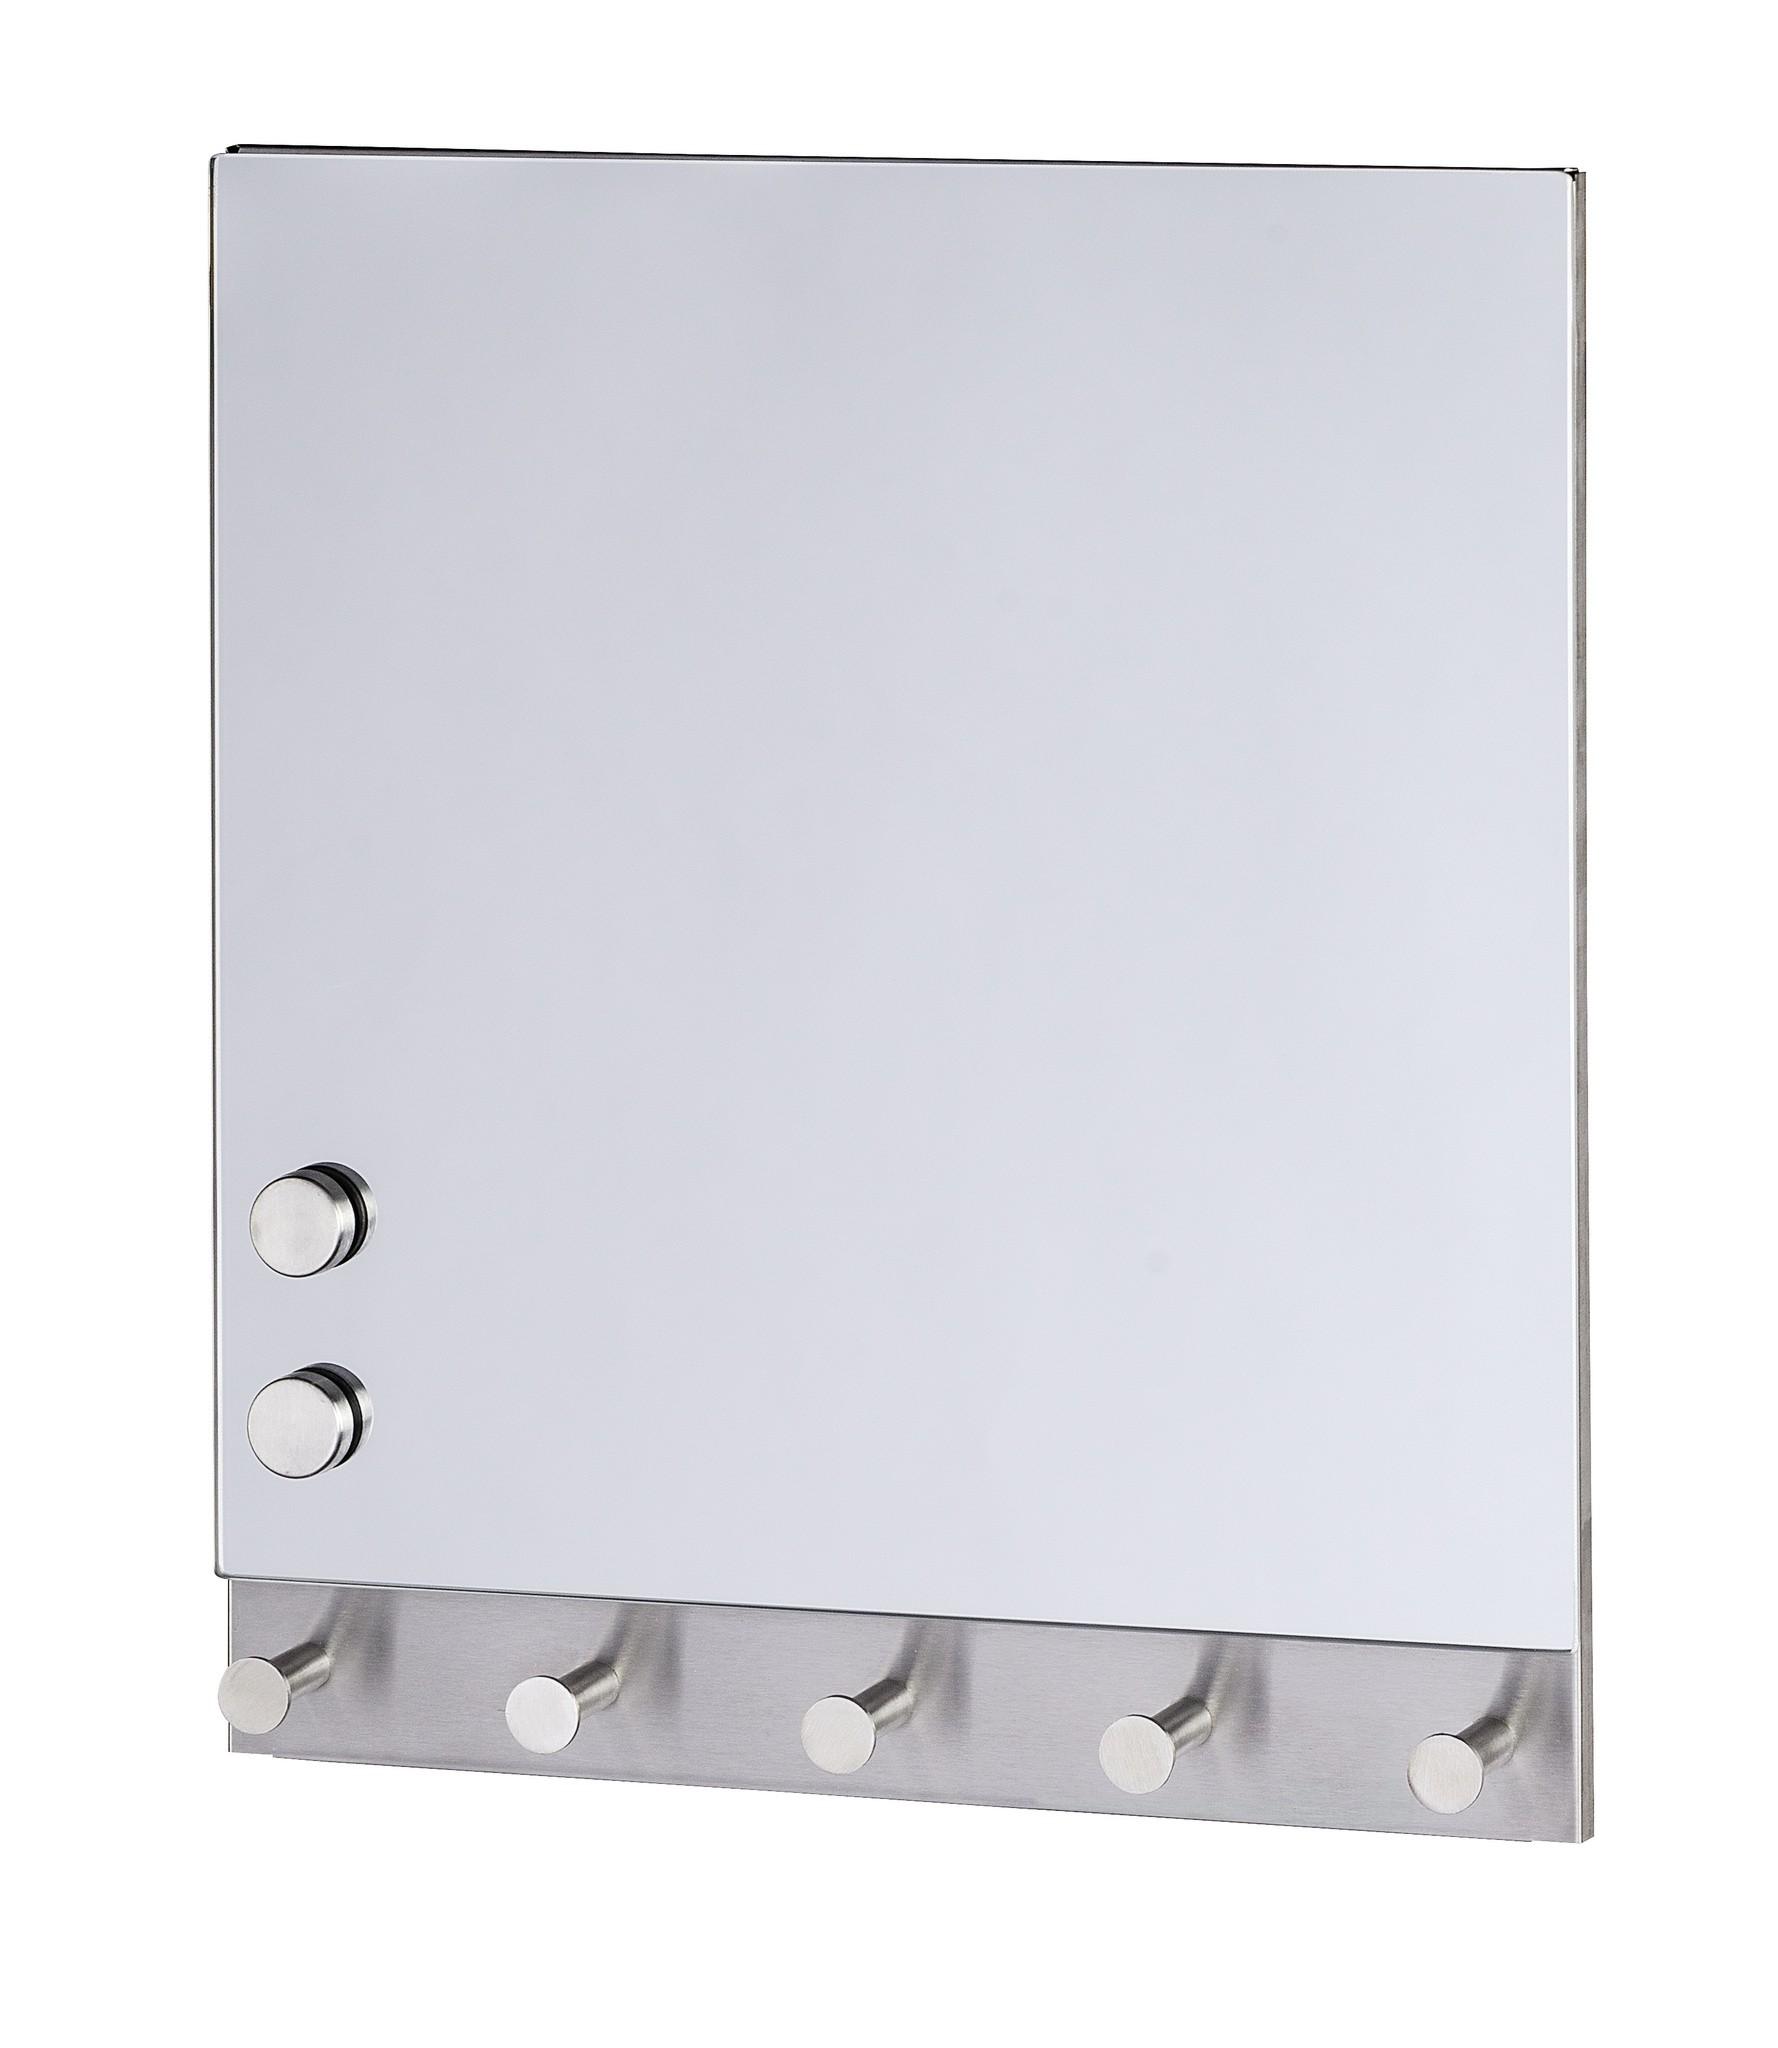 Wenko Magnetische Garderobe Mirror, 5 Haken, 30 x 34 cm